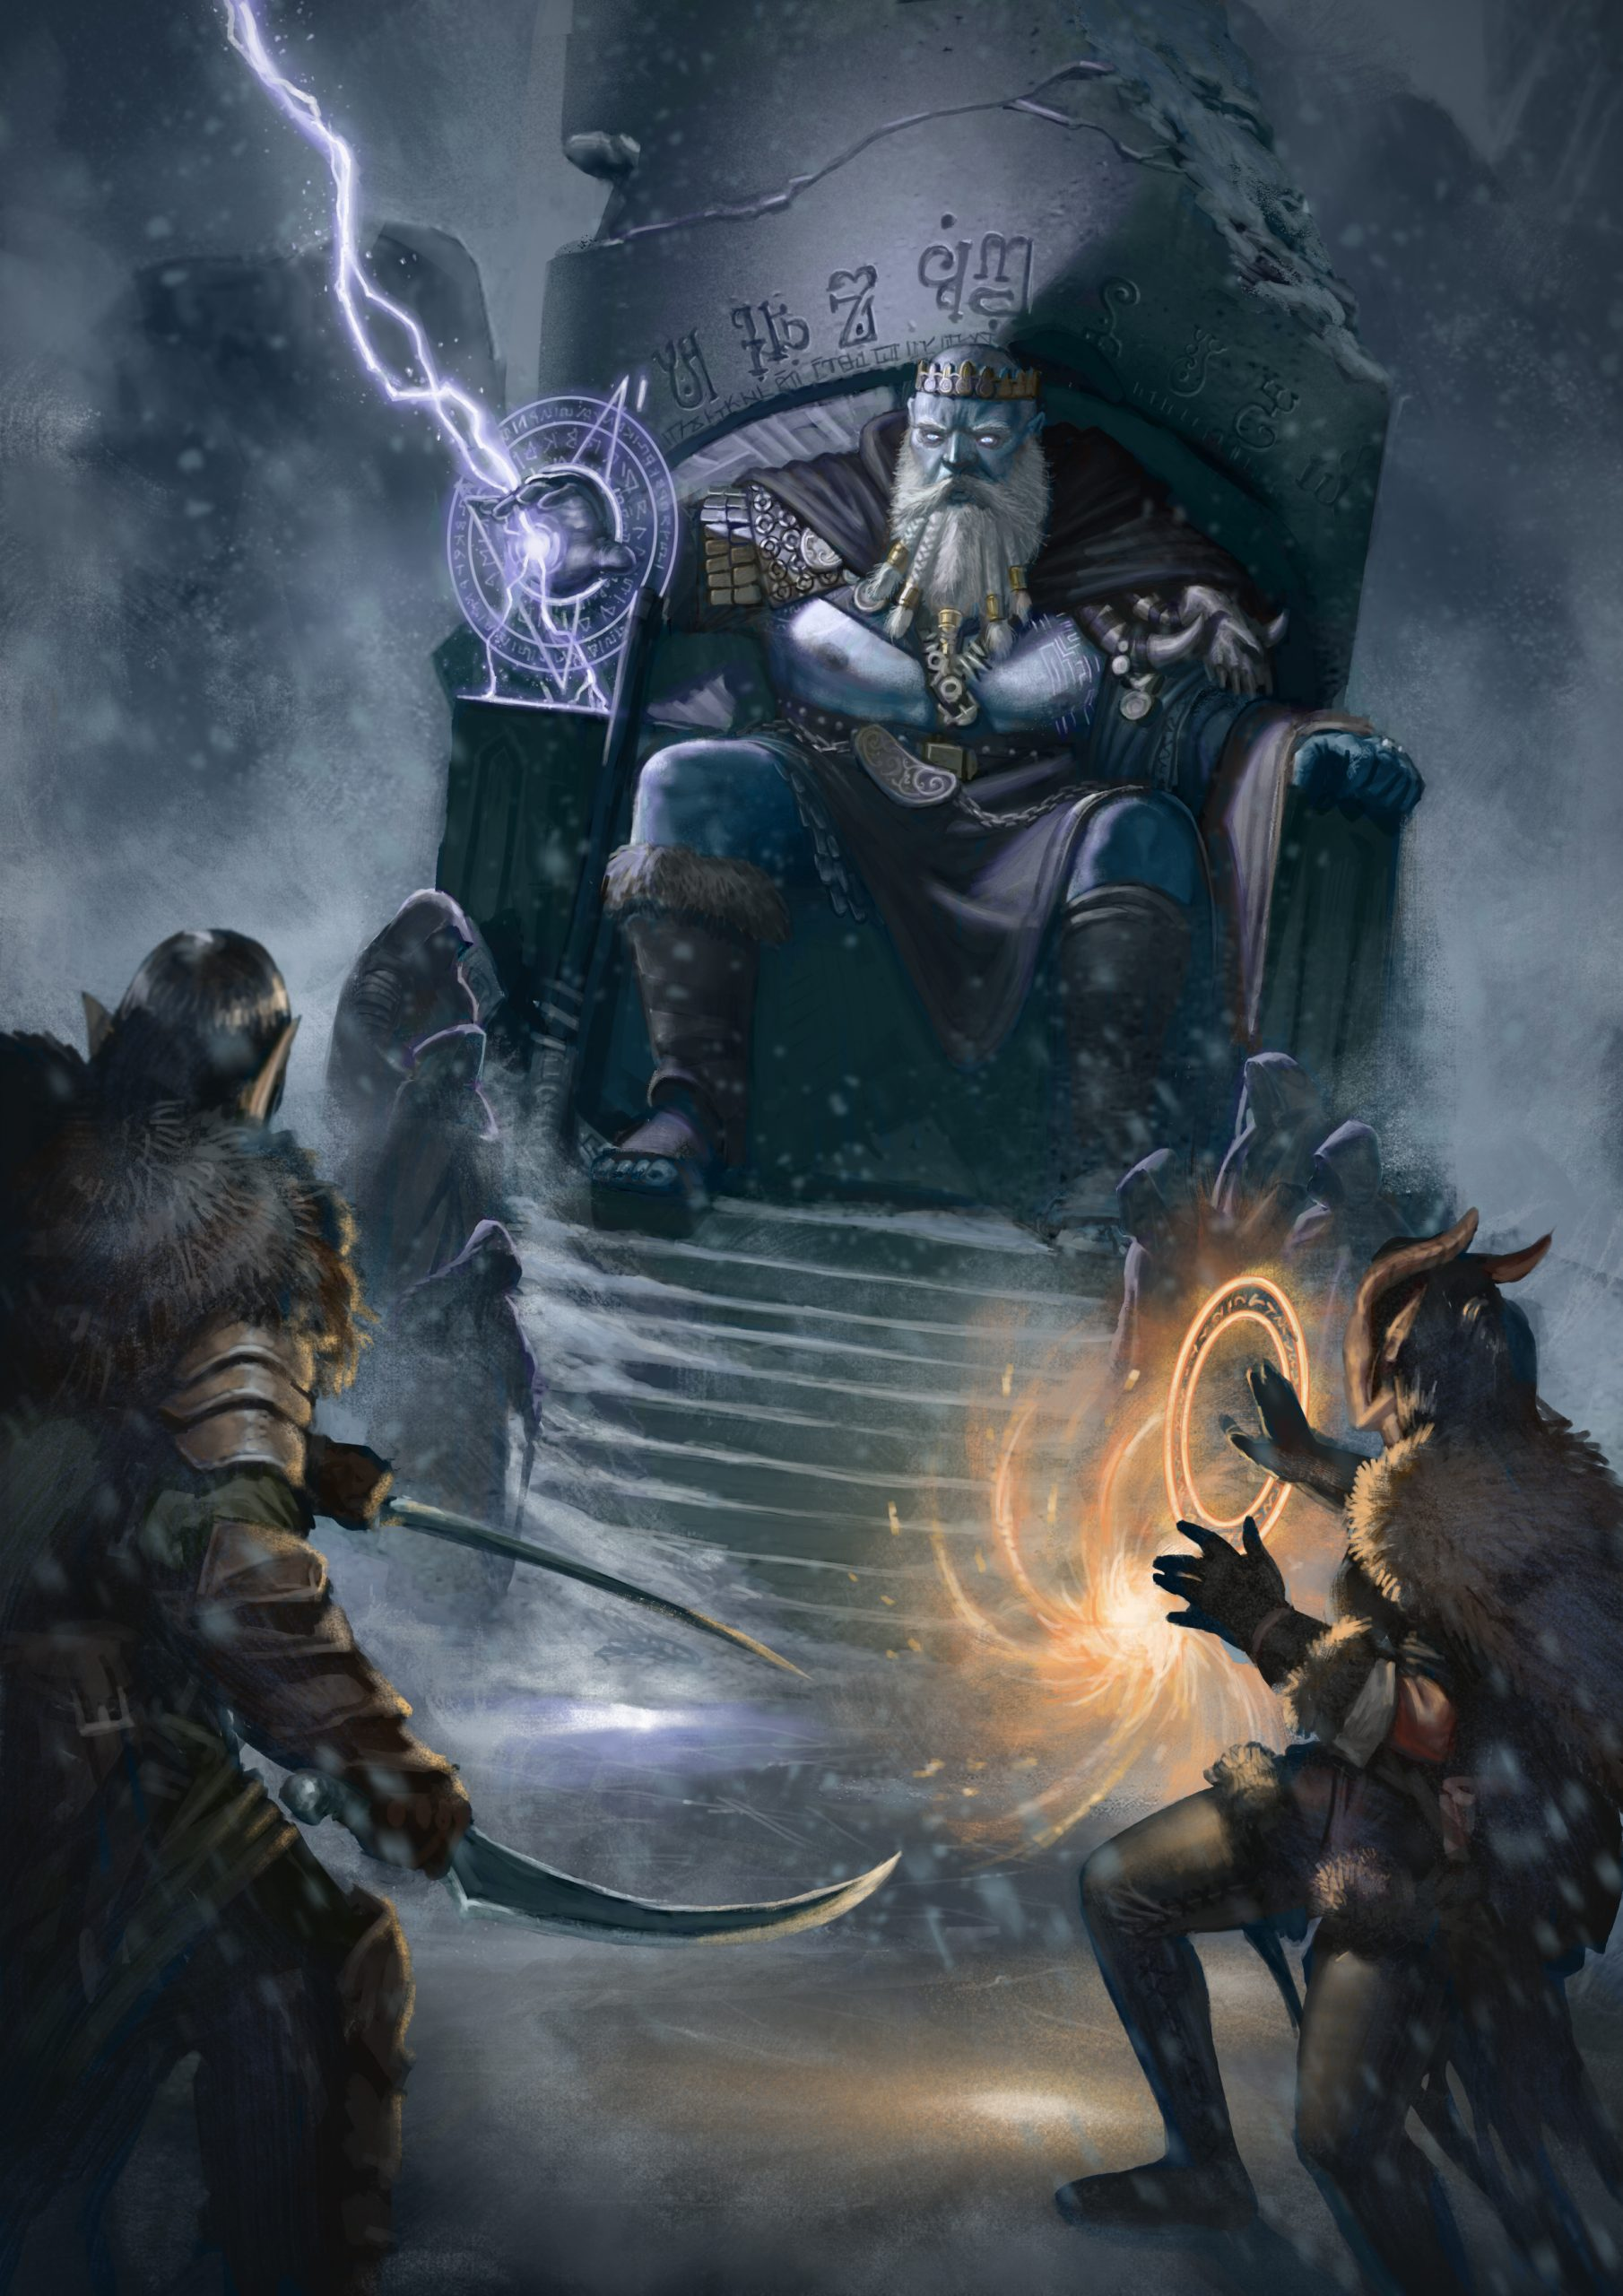 5E D&D frost king arctic hobgoblin